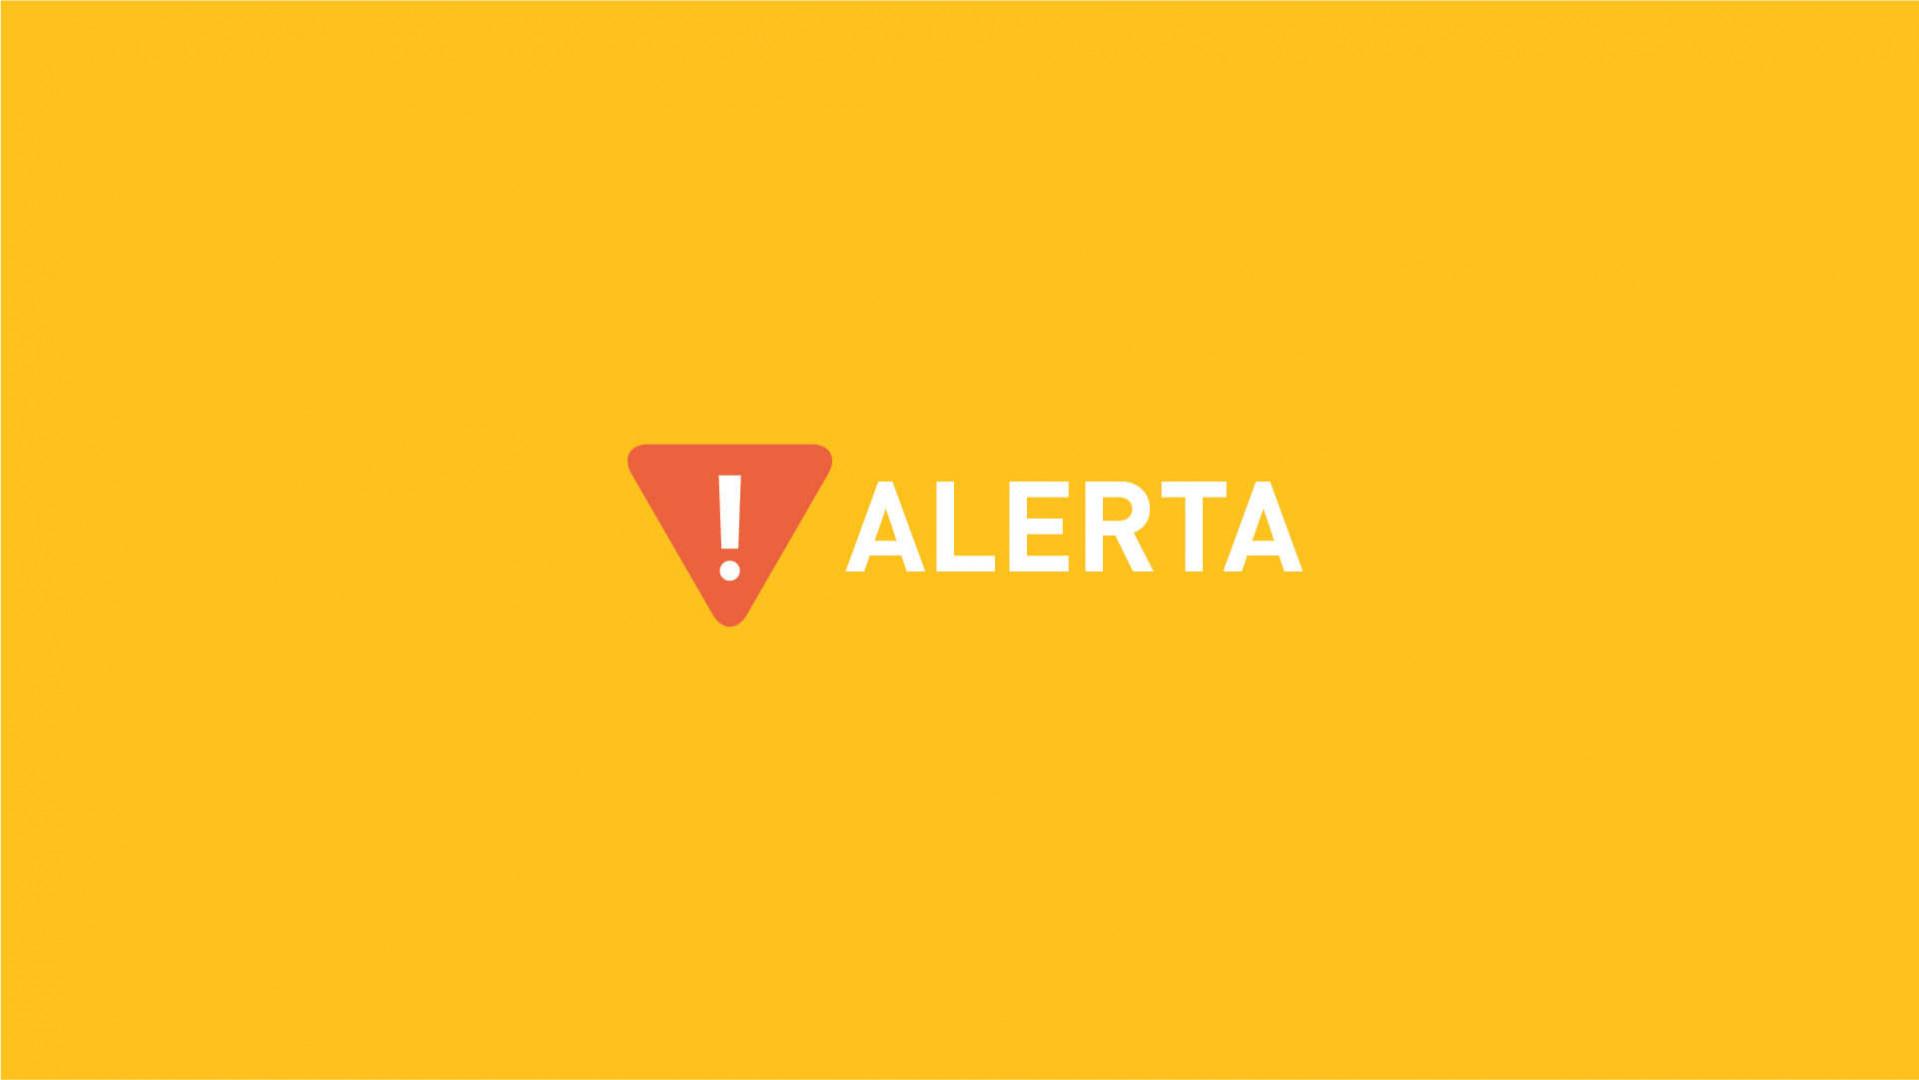 Alerta de seguridad para modelos de ventiladores de asistencia respiratoria  - PHILIPS RESPIRONICS   Argentina.gob.ar